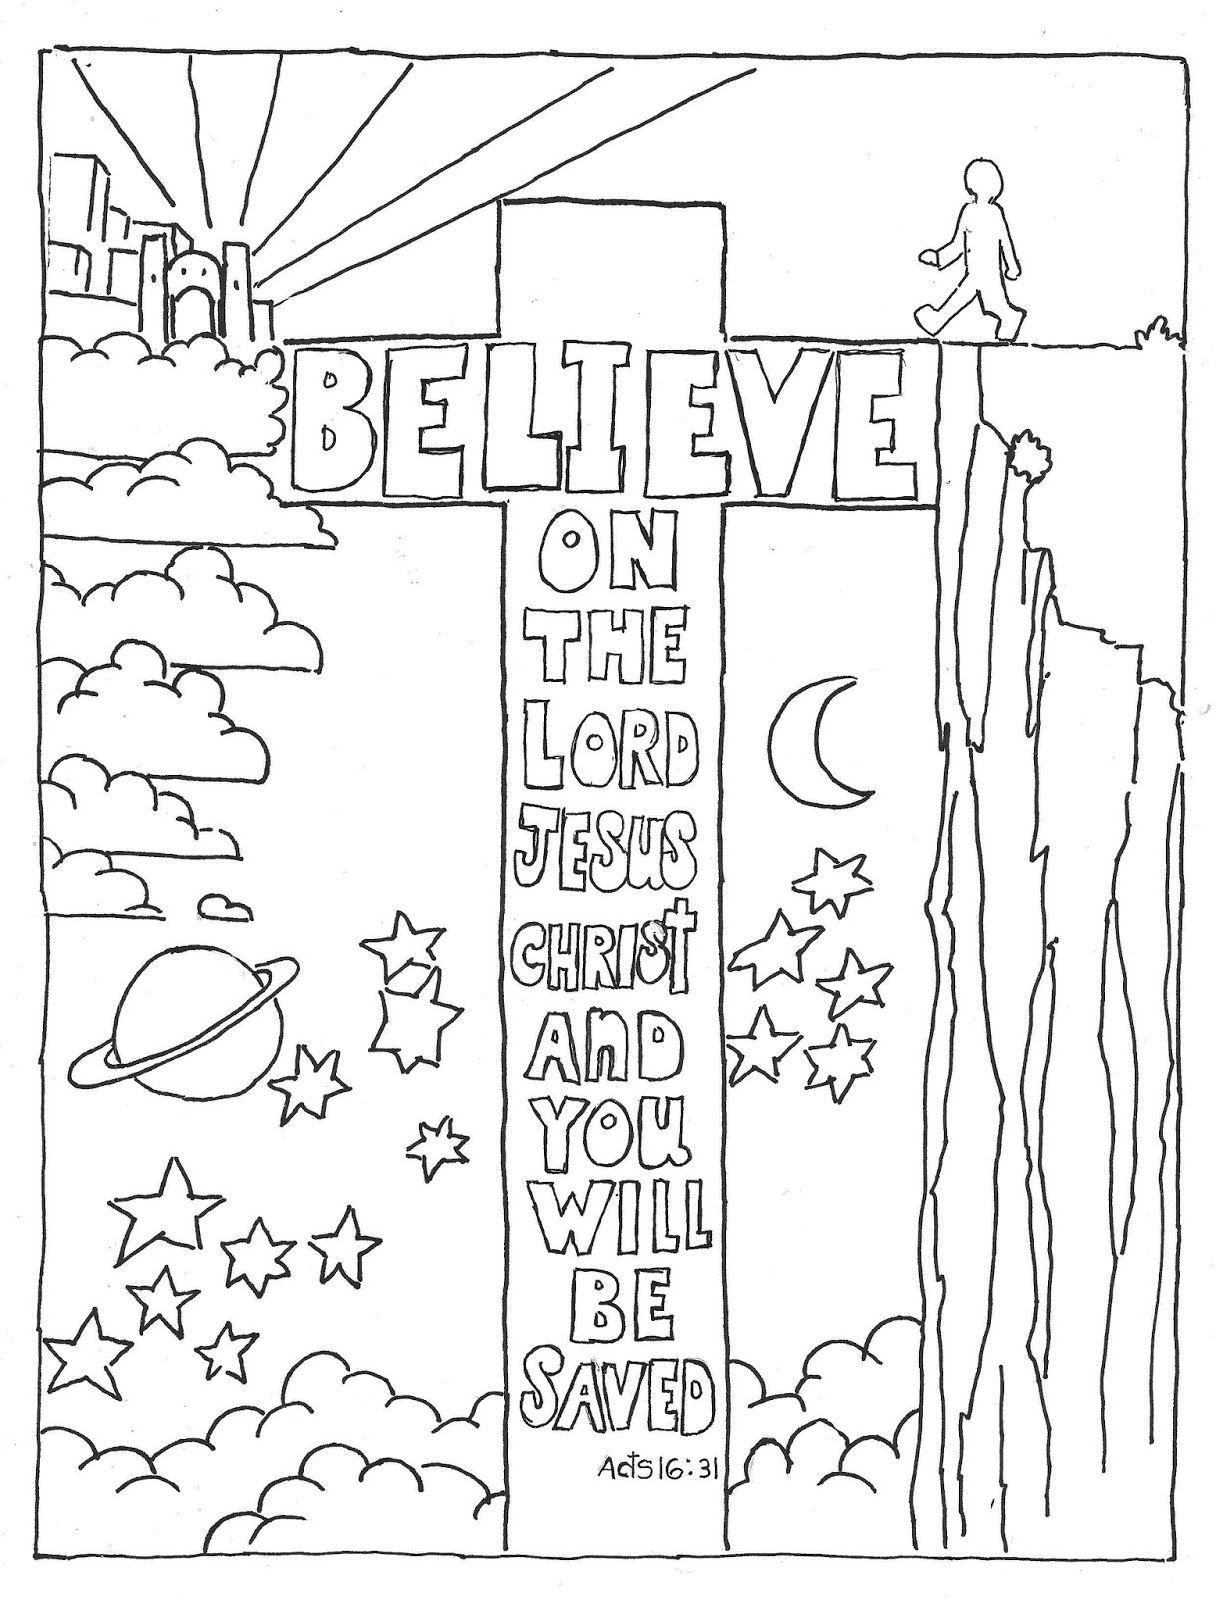 Pin By Diana Dobner On Schooling Fun Bible Coloring Pages Bible Verse Coloring Page Bible Coloring